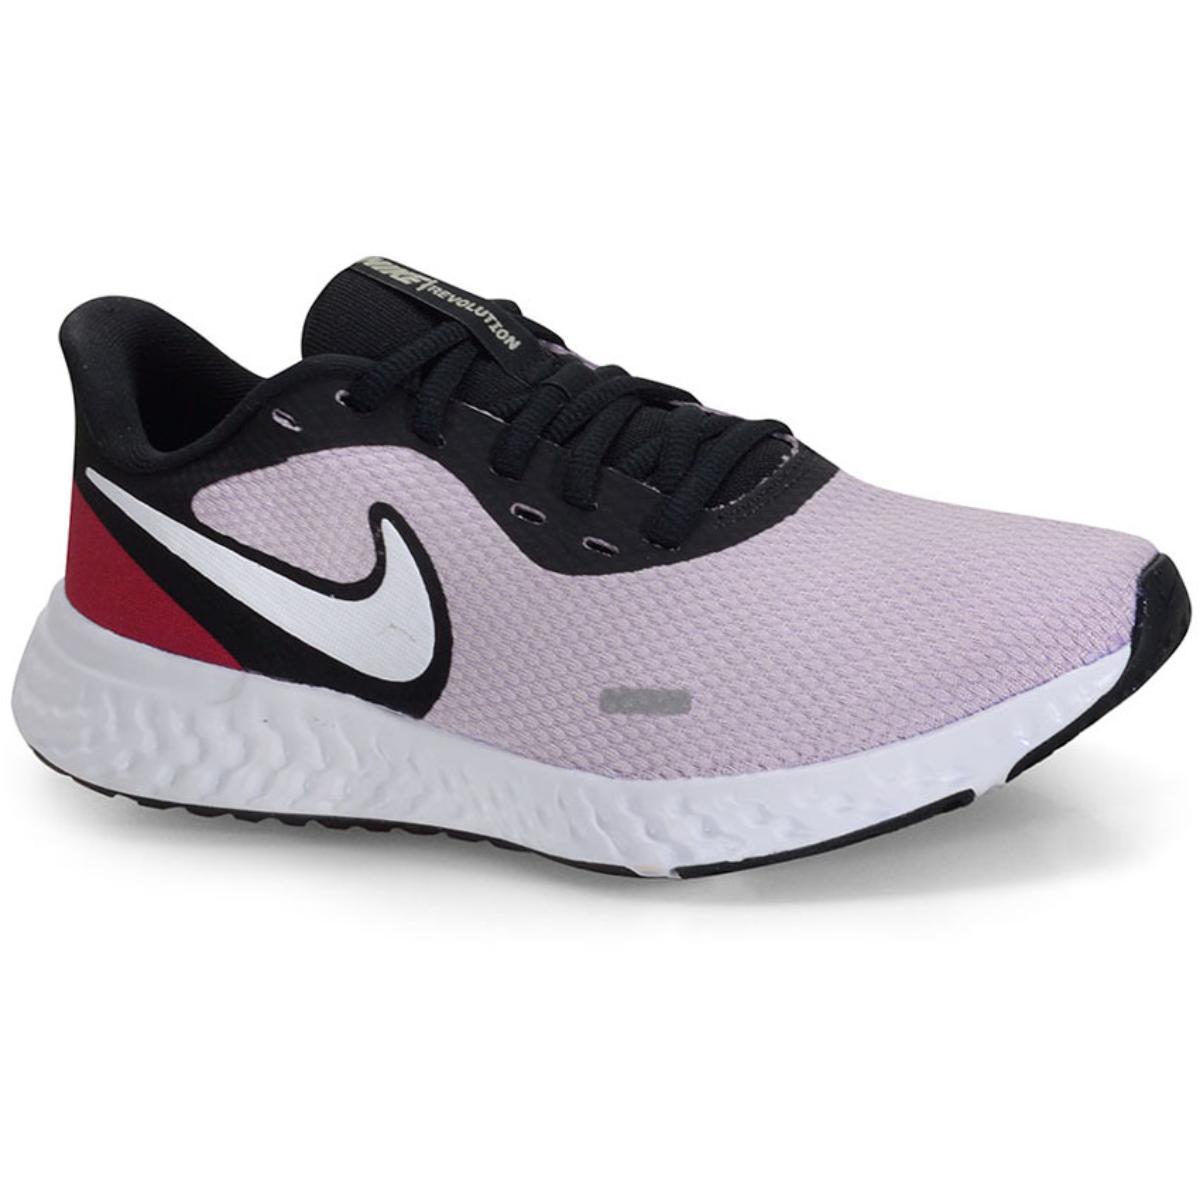 Tênis Feminino Nike Bq3207-501 Revolution 5 Rosa/preto